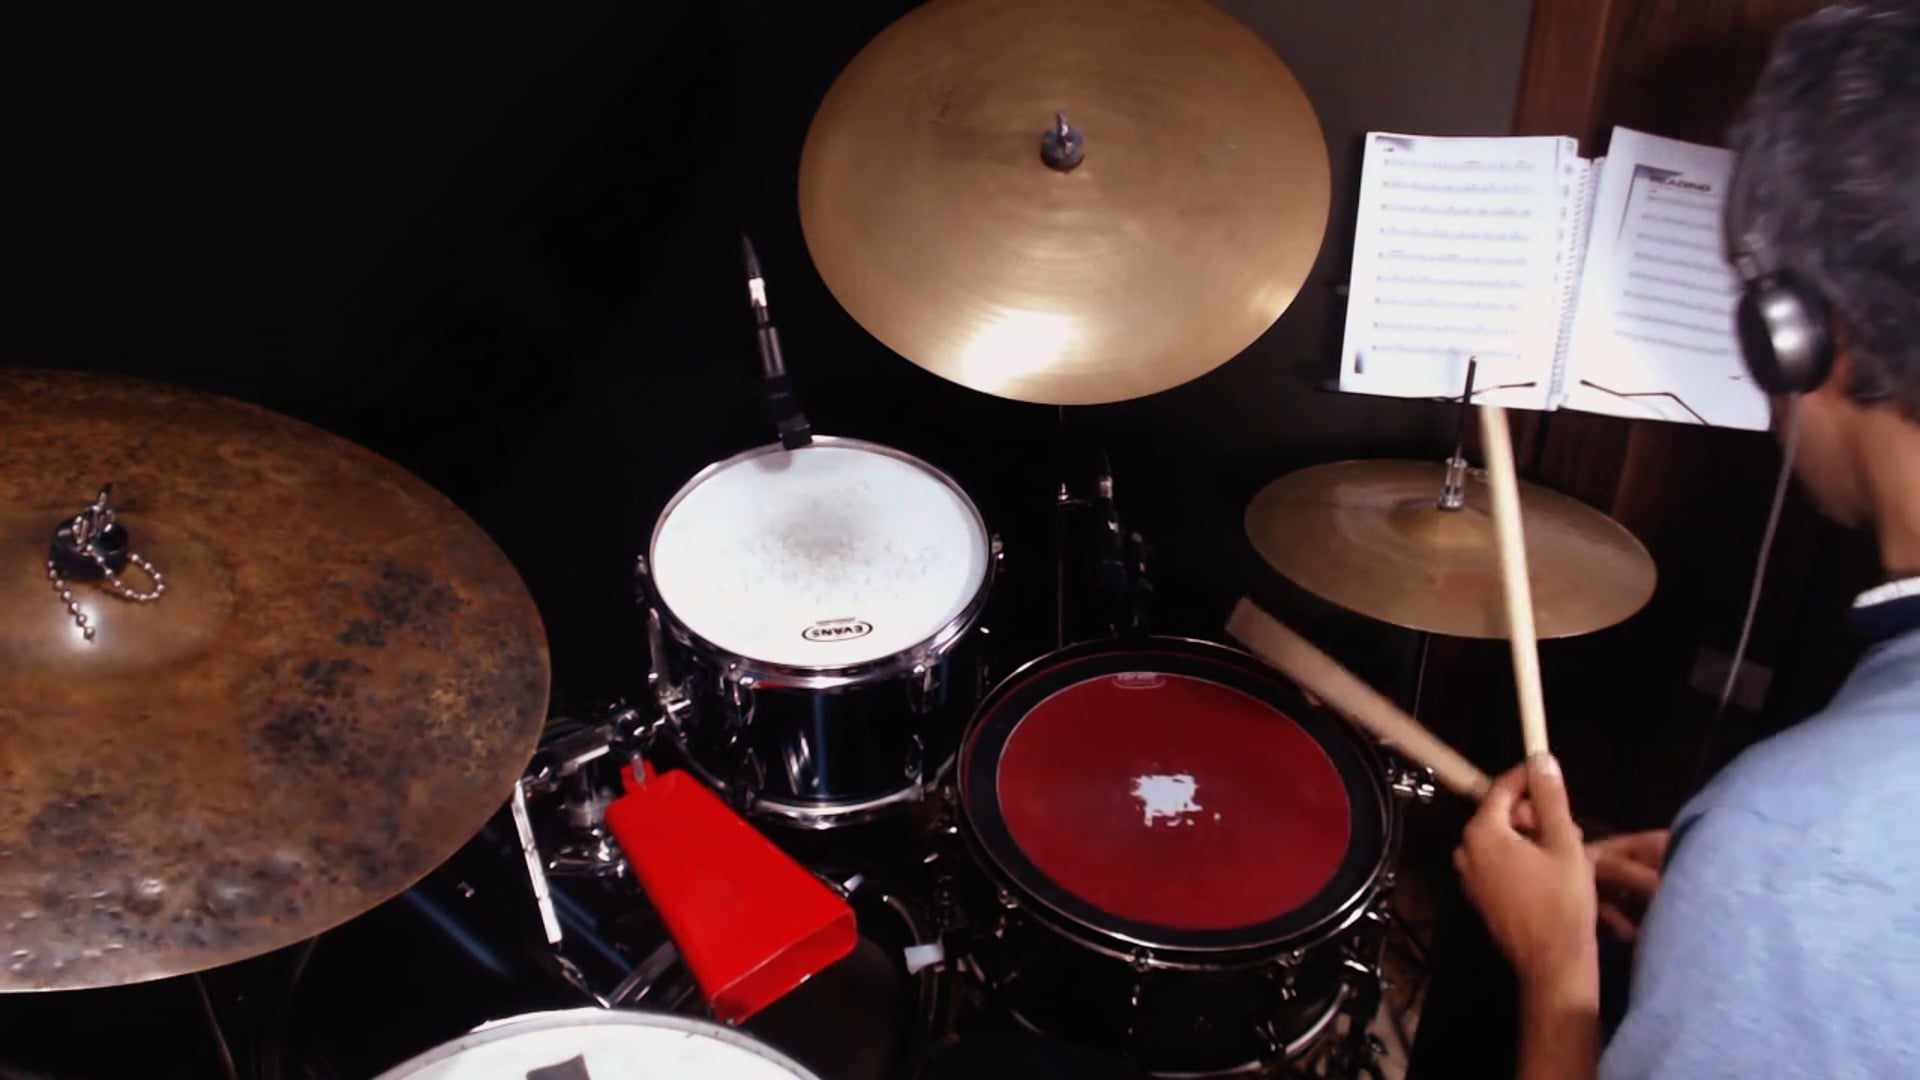 Variações de bumbo - Gary Chaster 2